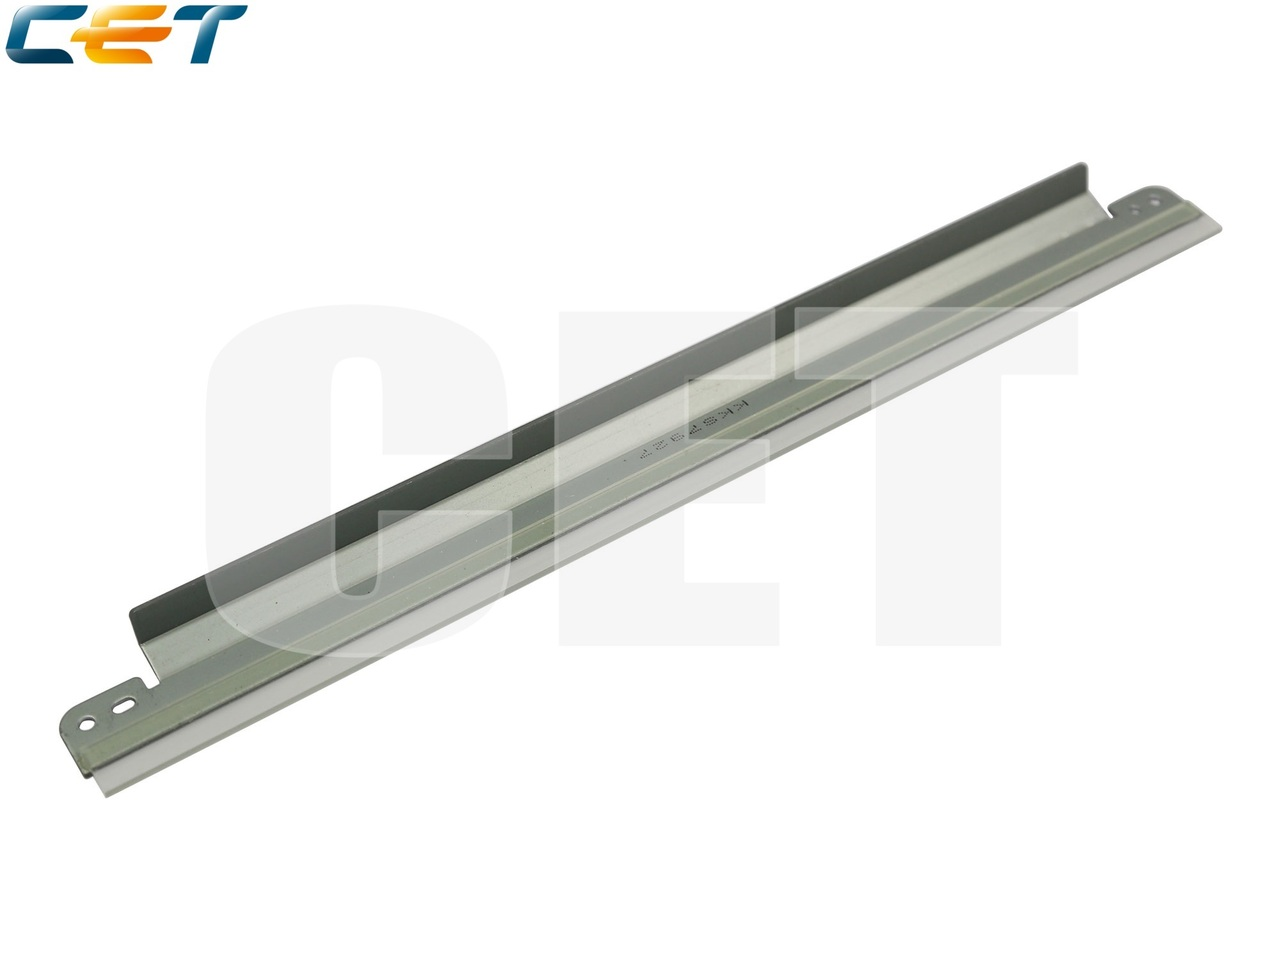 Ракель для XEROX WorkCentre7120/7125/7220/7220T/7225/7225T (CET), CET7927